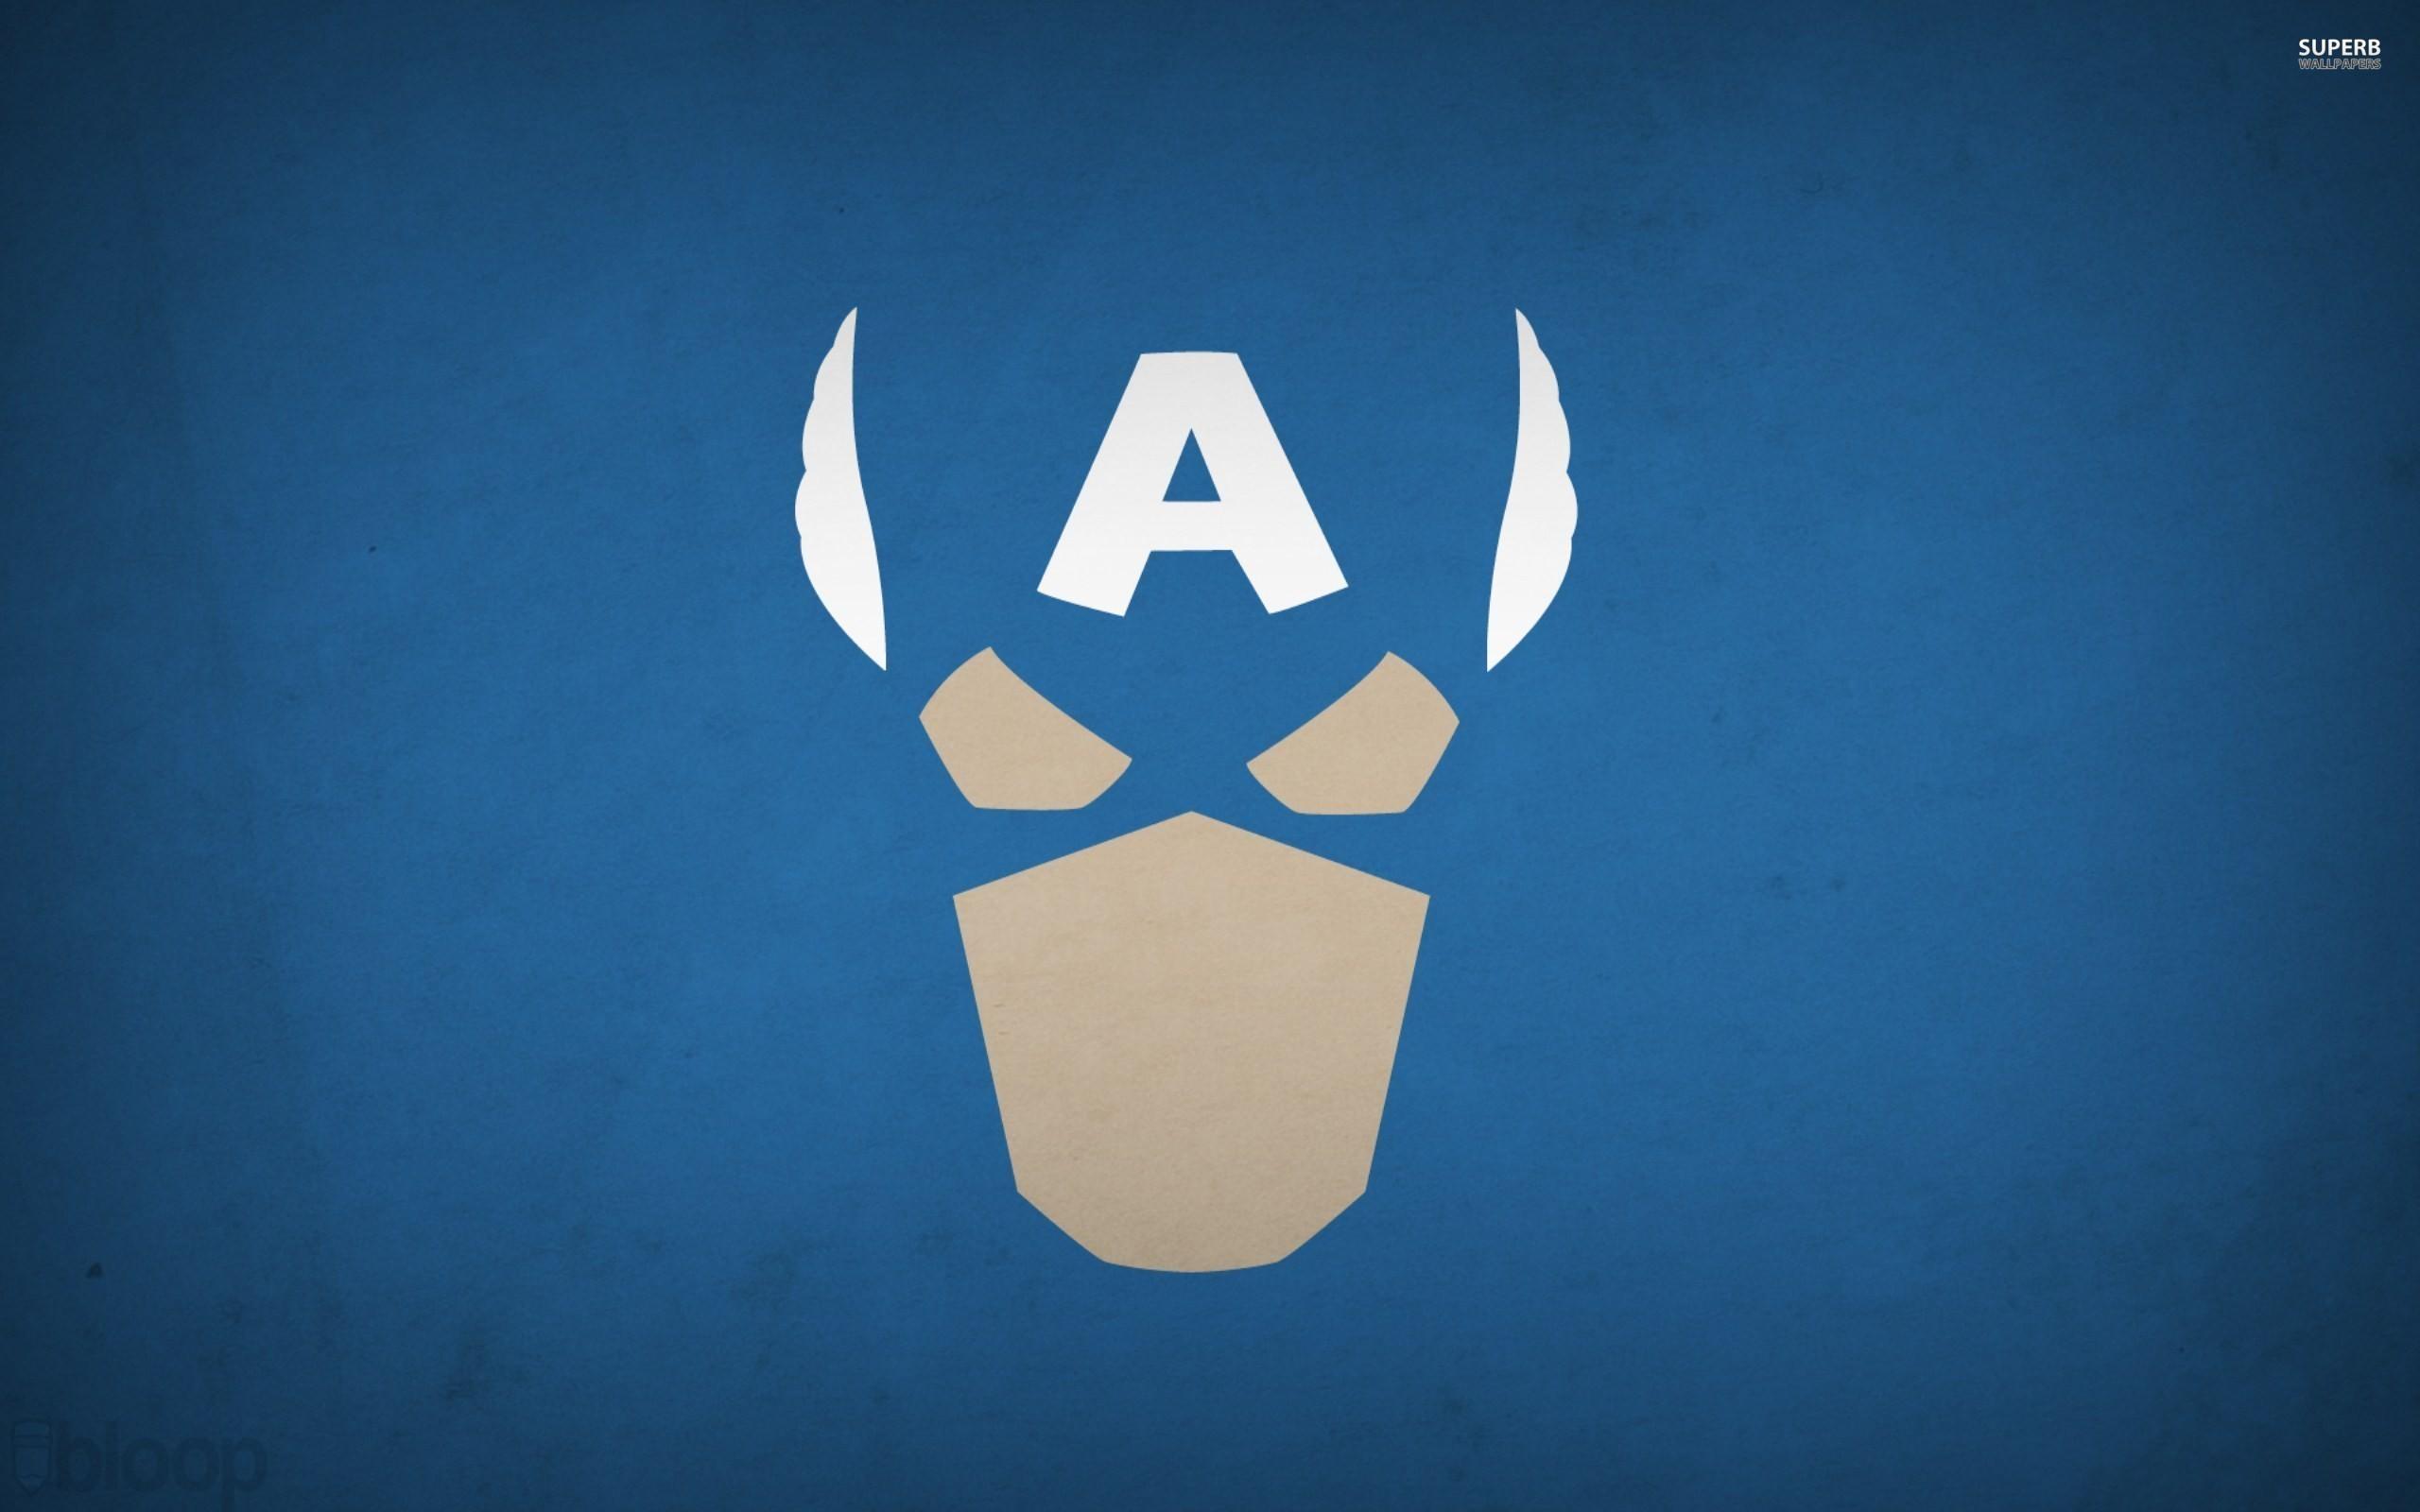 Free Captain America Wallpaper Photo @2VT Â« Wallx